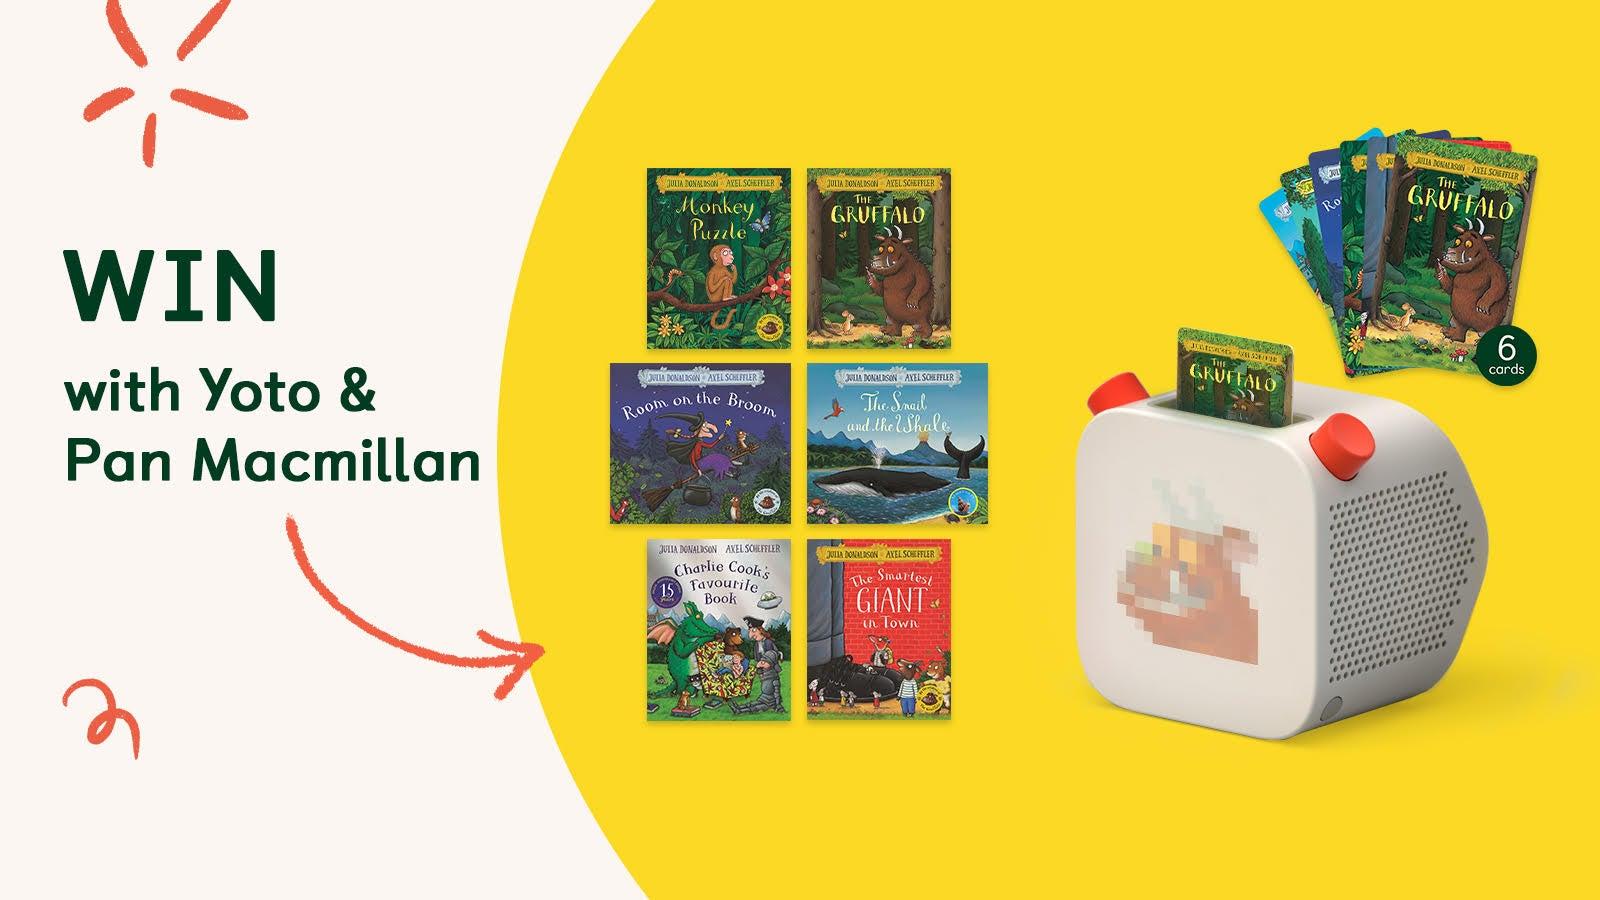 A graphic that says 'WIN with Yoto & Pan Macmillan' and shows 6 Pan Macmillan Julia Donaldson titles next to a Yoto player and Yoto cards.